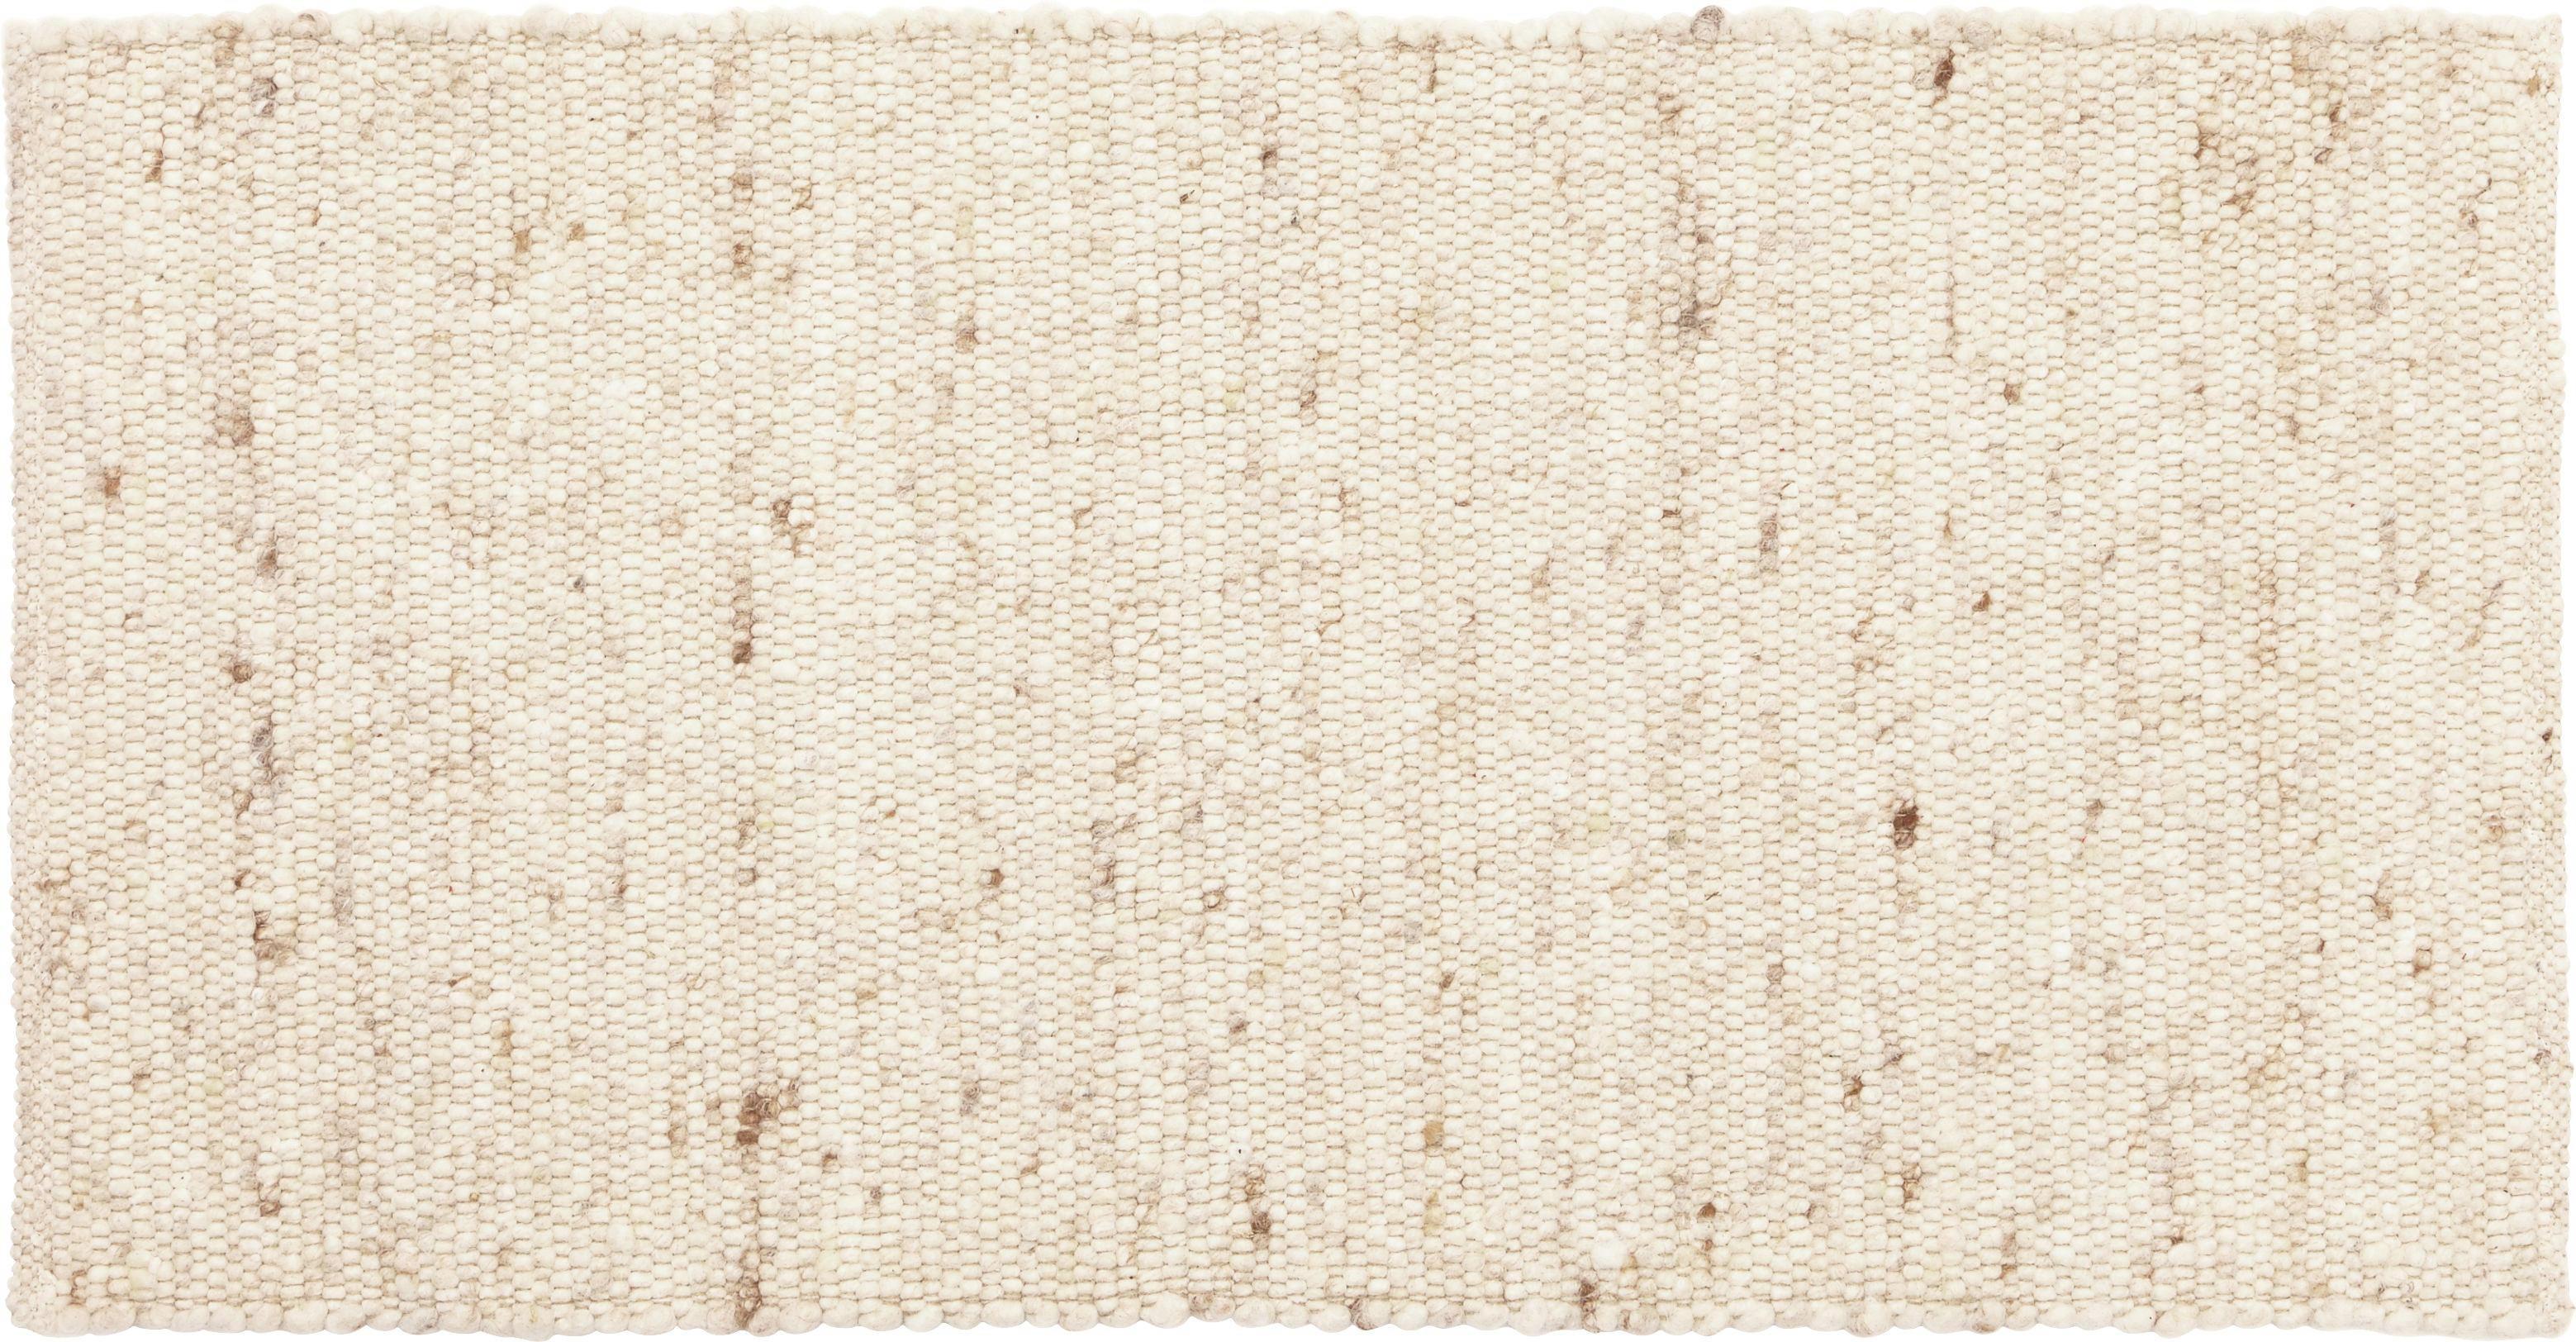 HANDWEBTEPPICH 70/130 cm - Creme, LIFESTYLE, Textil (70/130cm) - LINEA NATURA